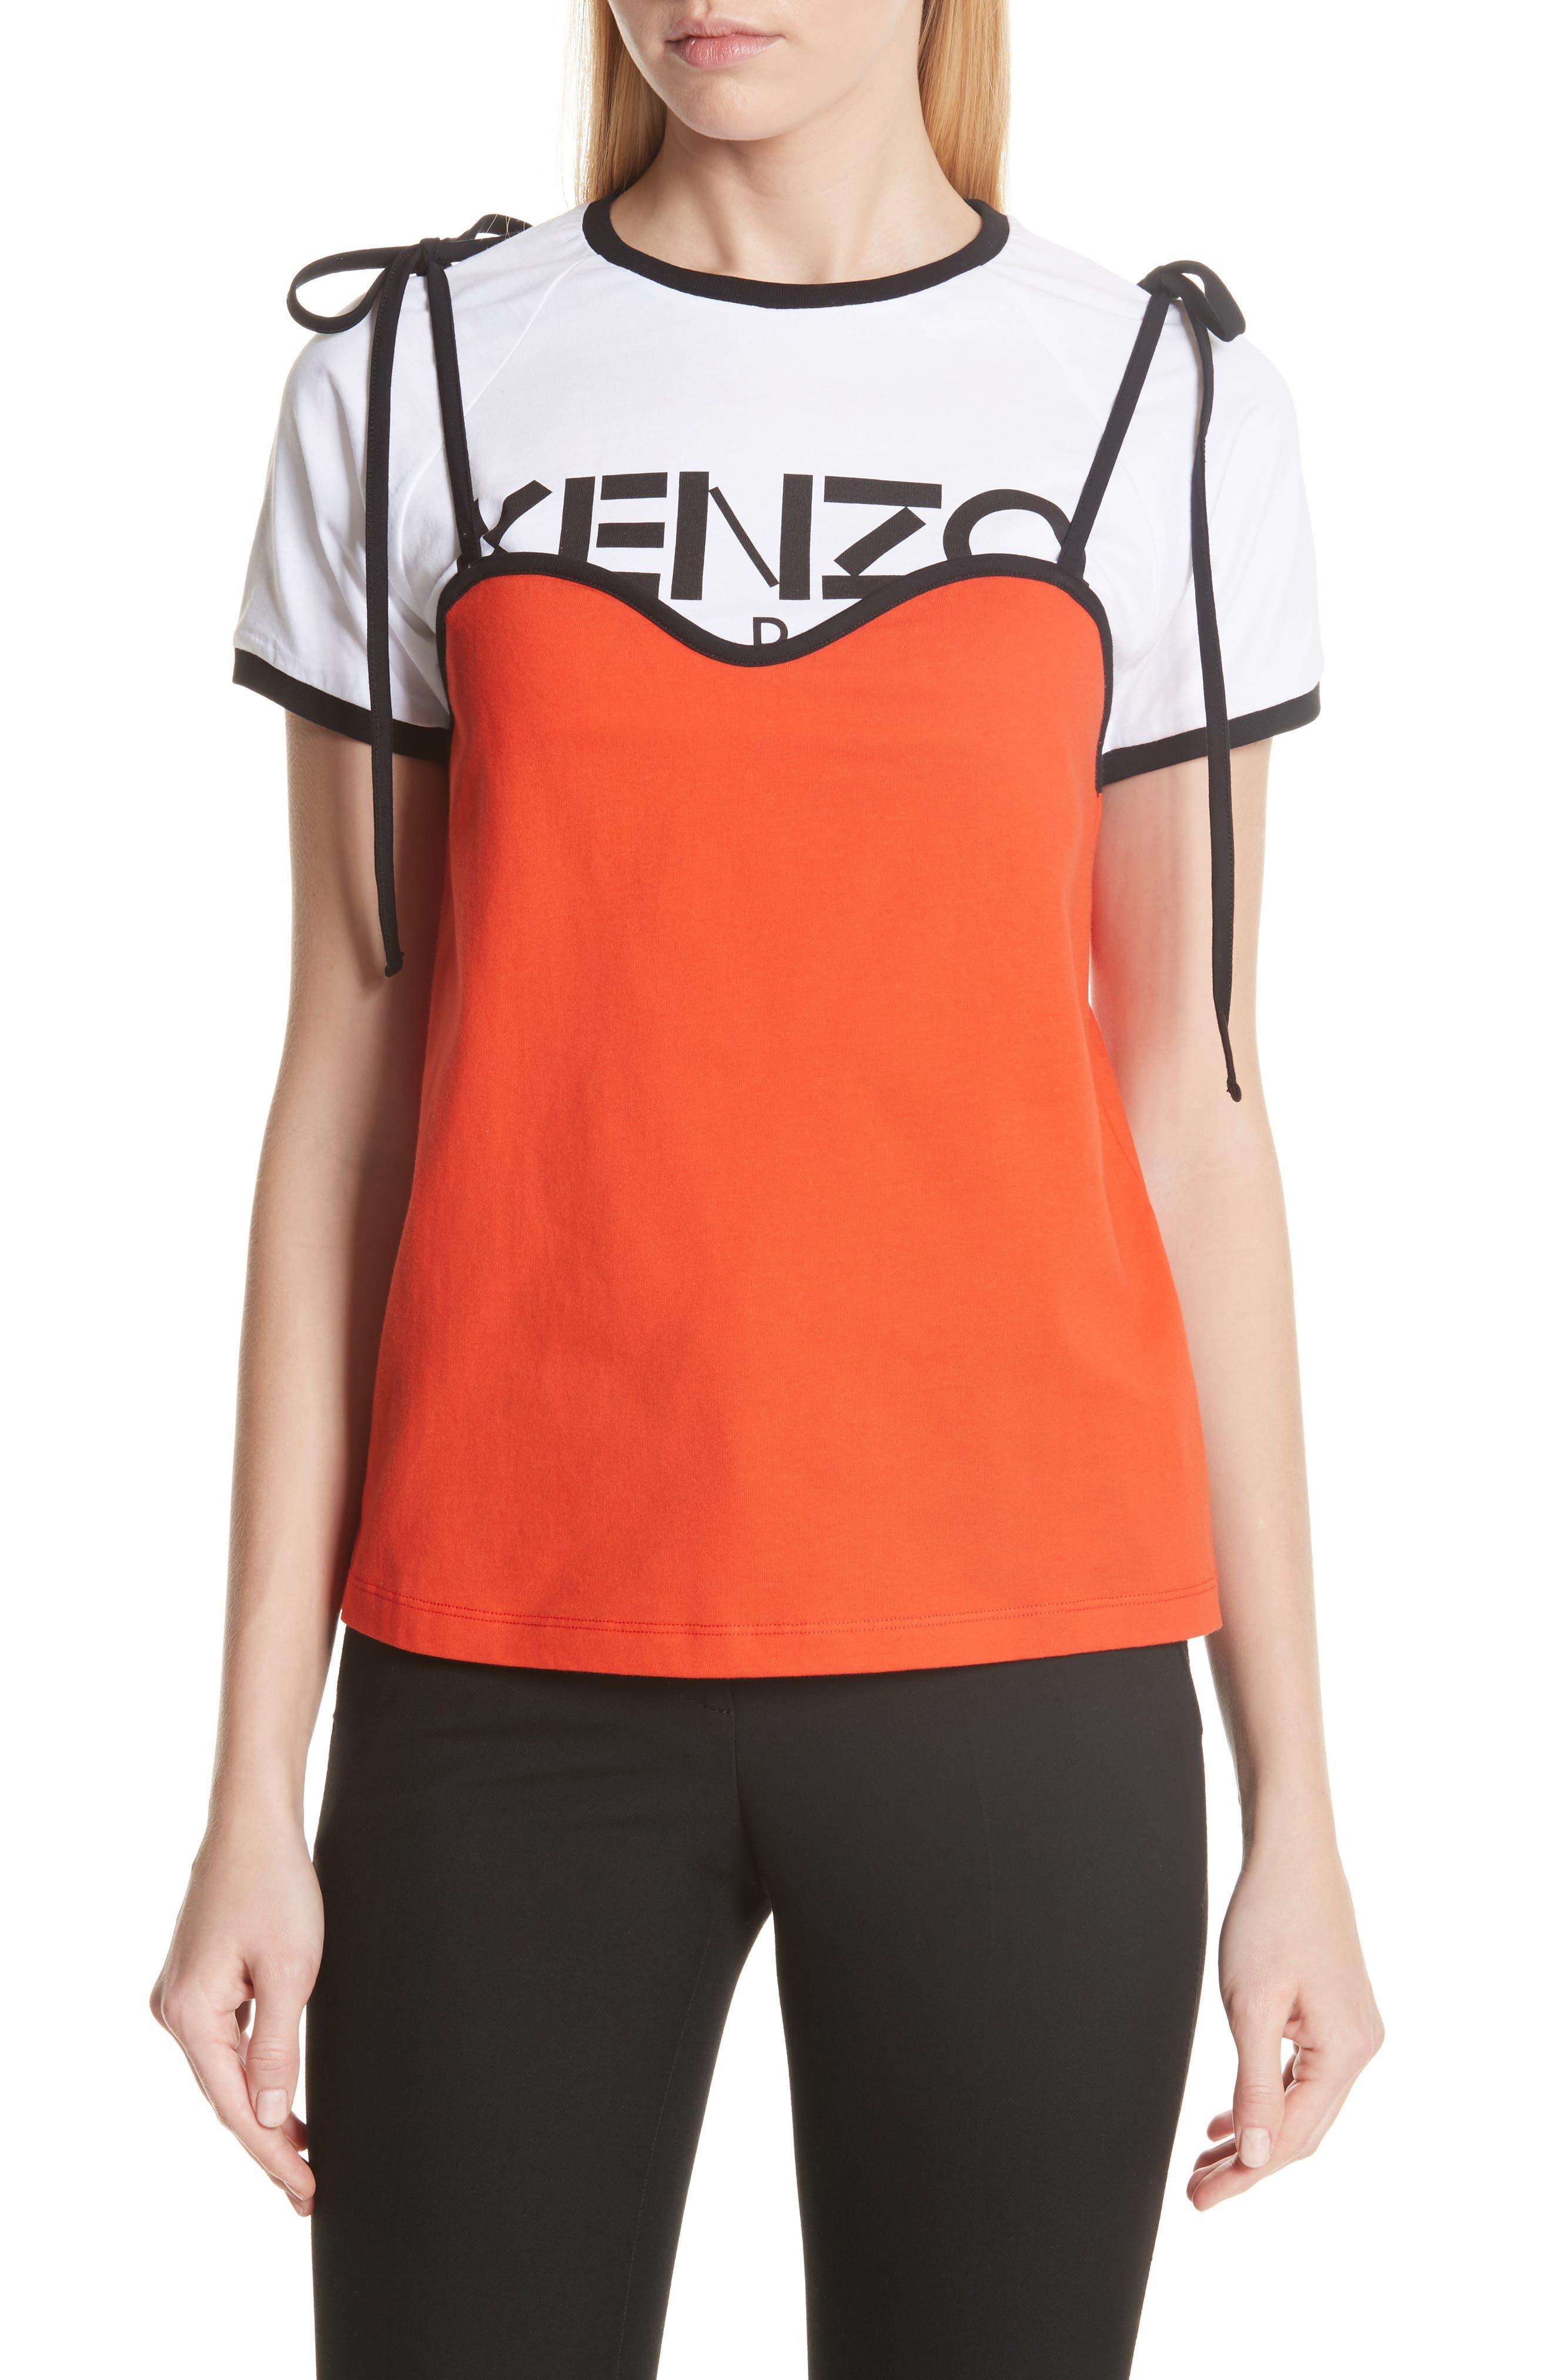 KENZO Layered Logo Top